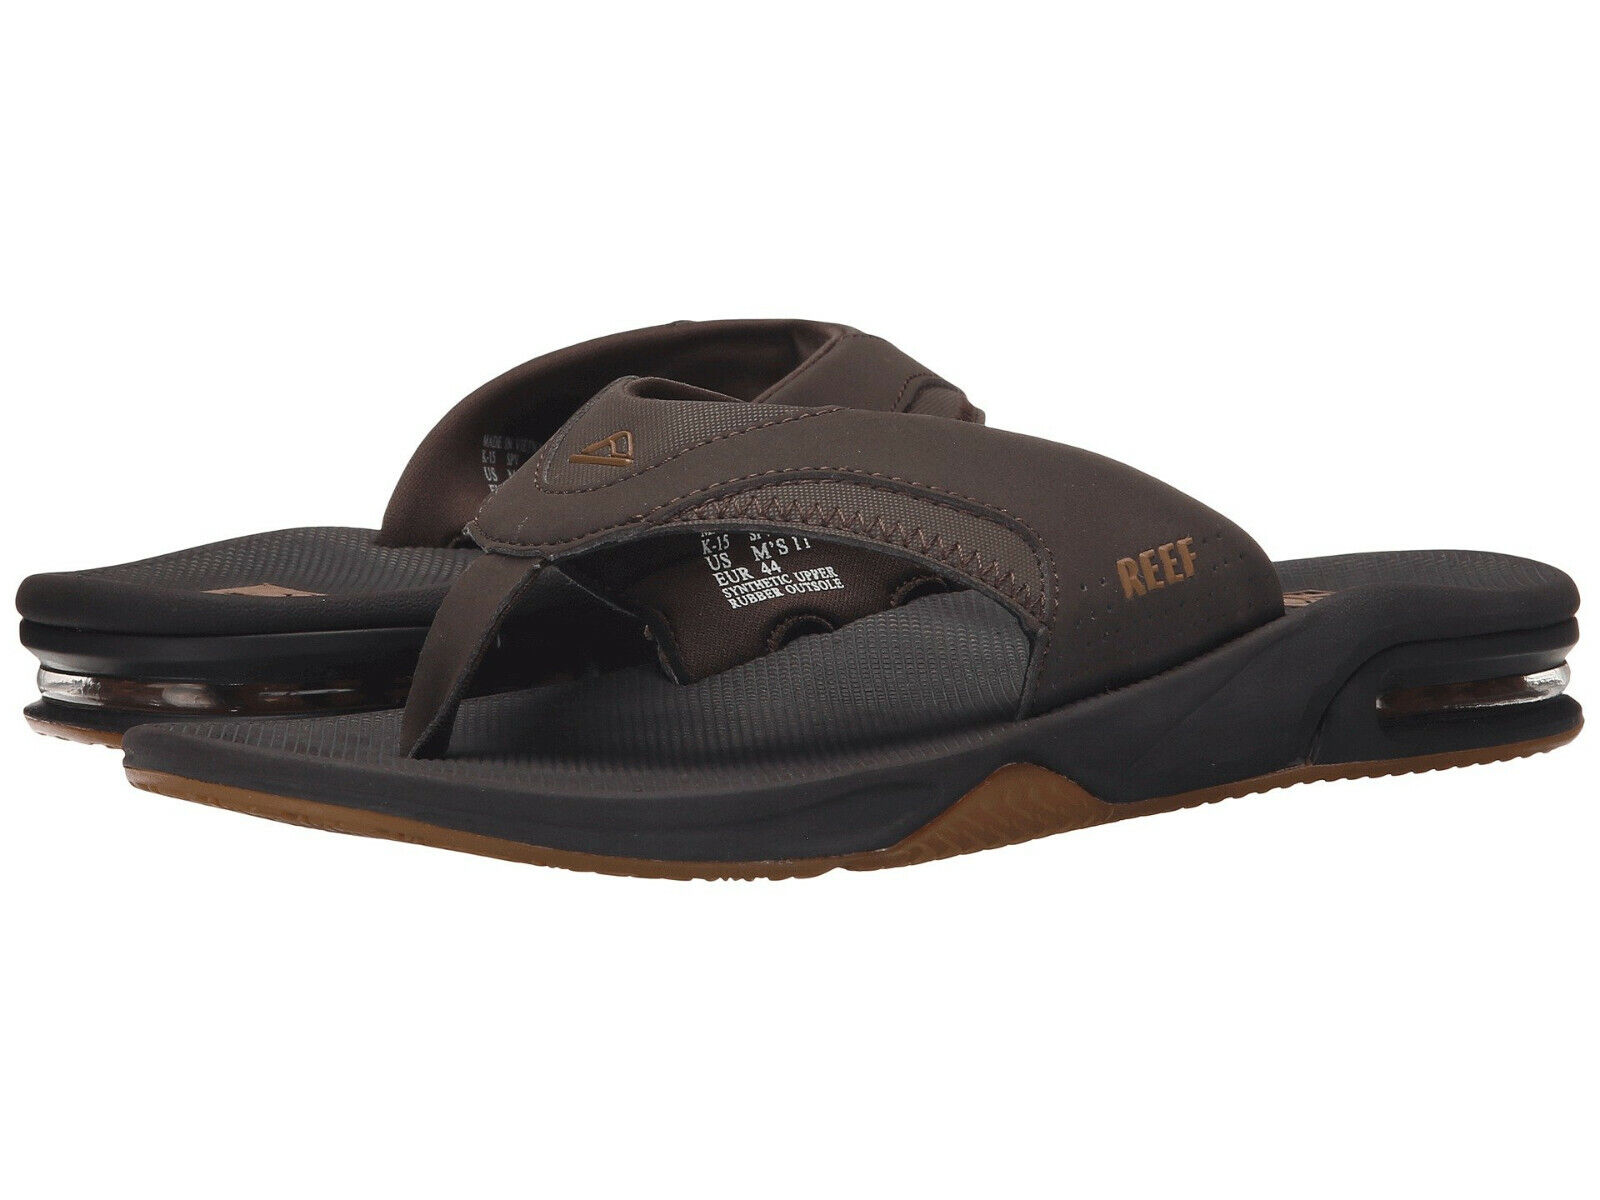 Reef Men's Fanning Flip Flop Sandal RF2026 Brown Gum 100% Authentic Brand New